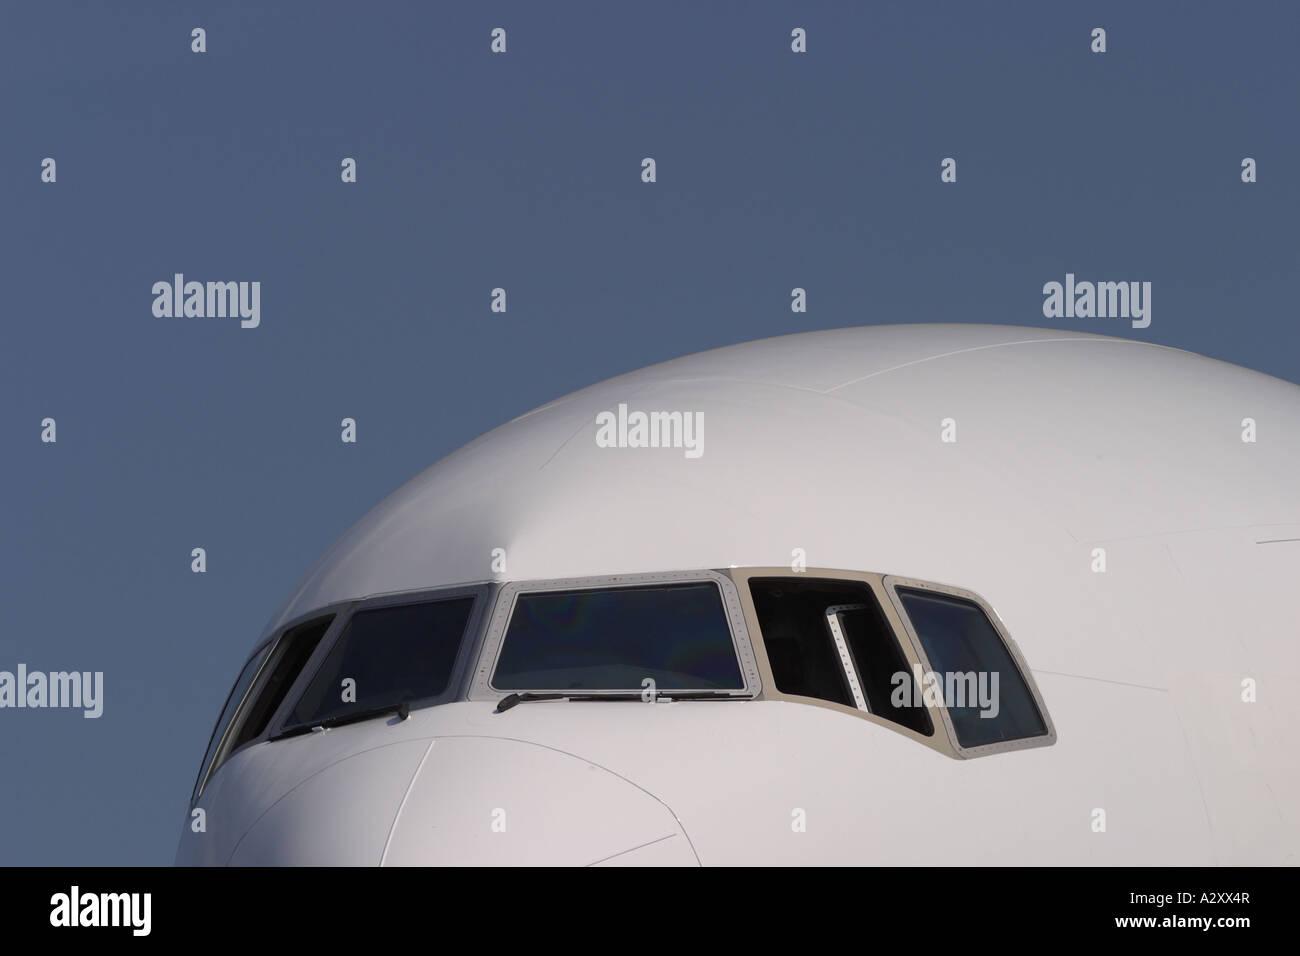 Commercial airliner passenger jet airline - Stock Image